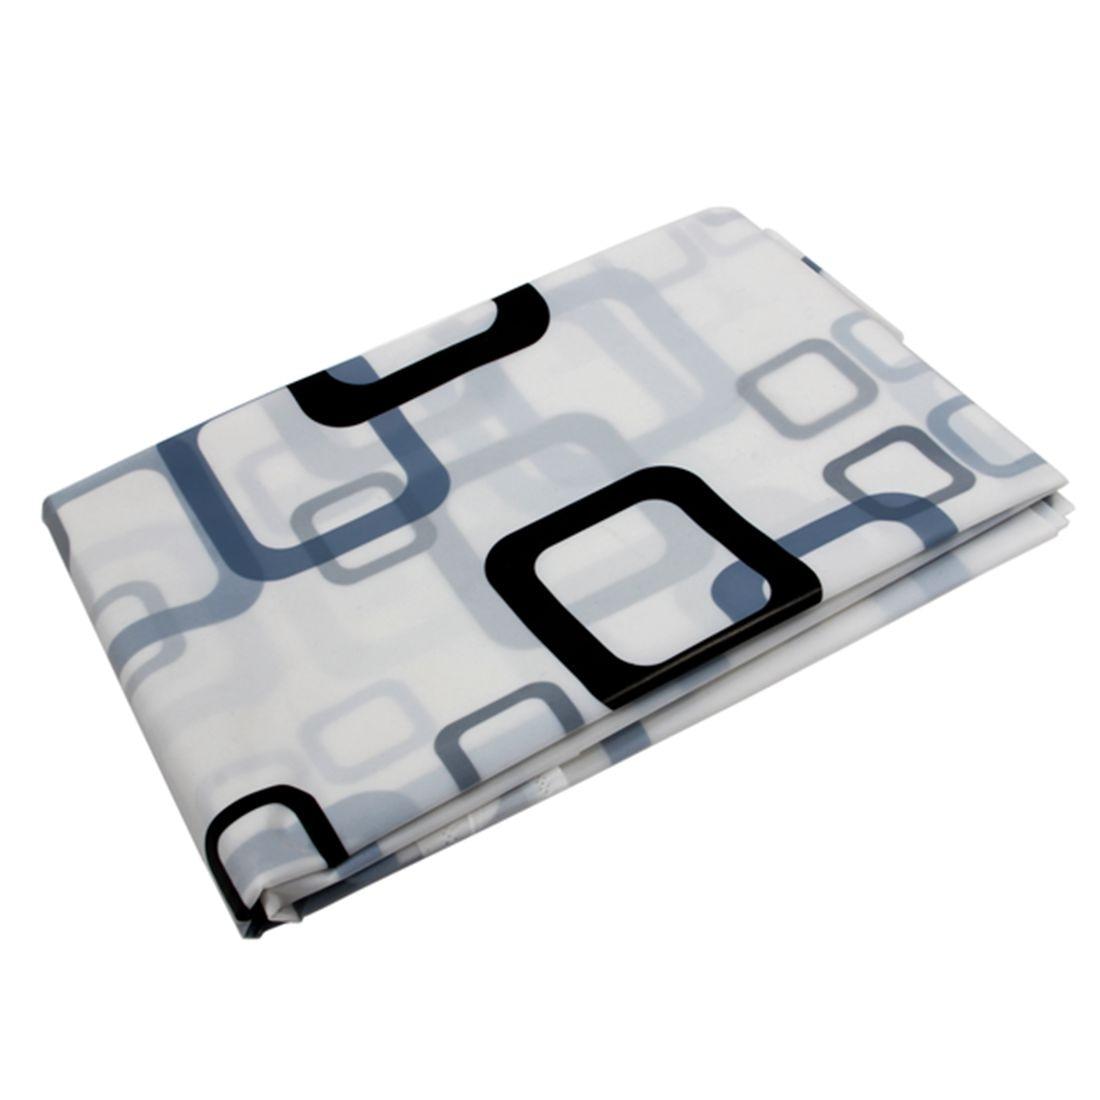 Best 180cm x 180 cm Black White Square Bathroom Waterproof Fabric Bath Shower Curtain